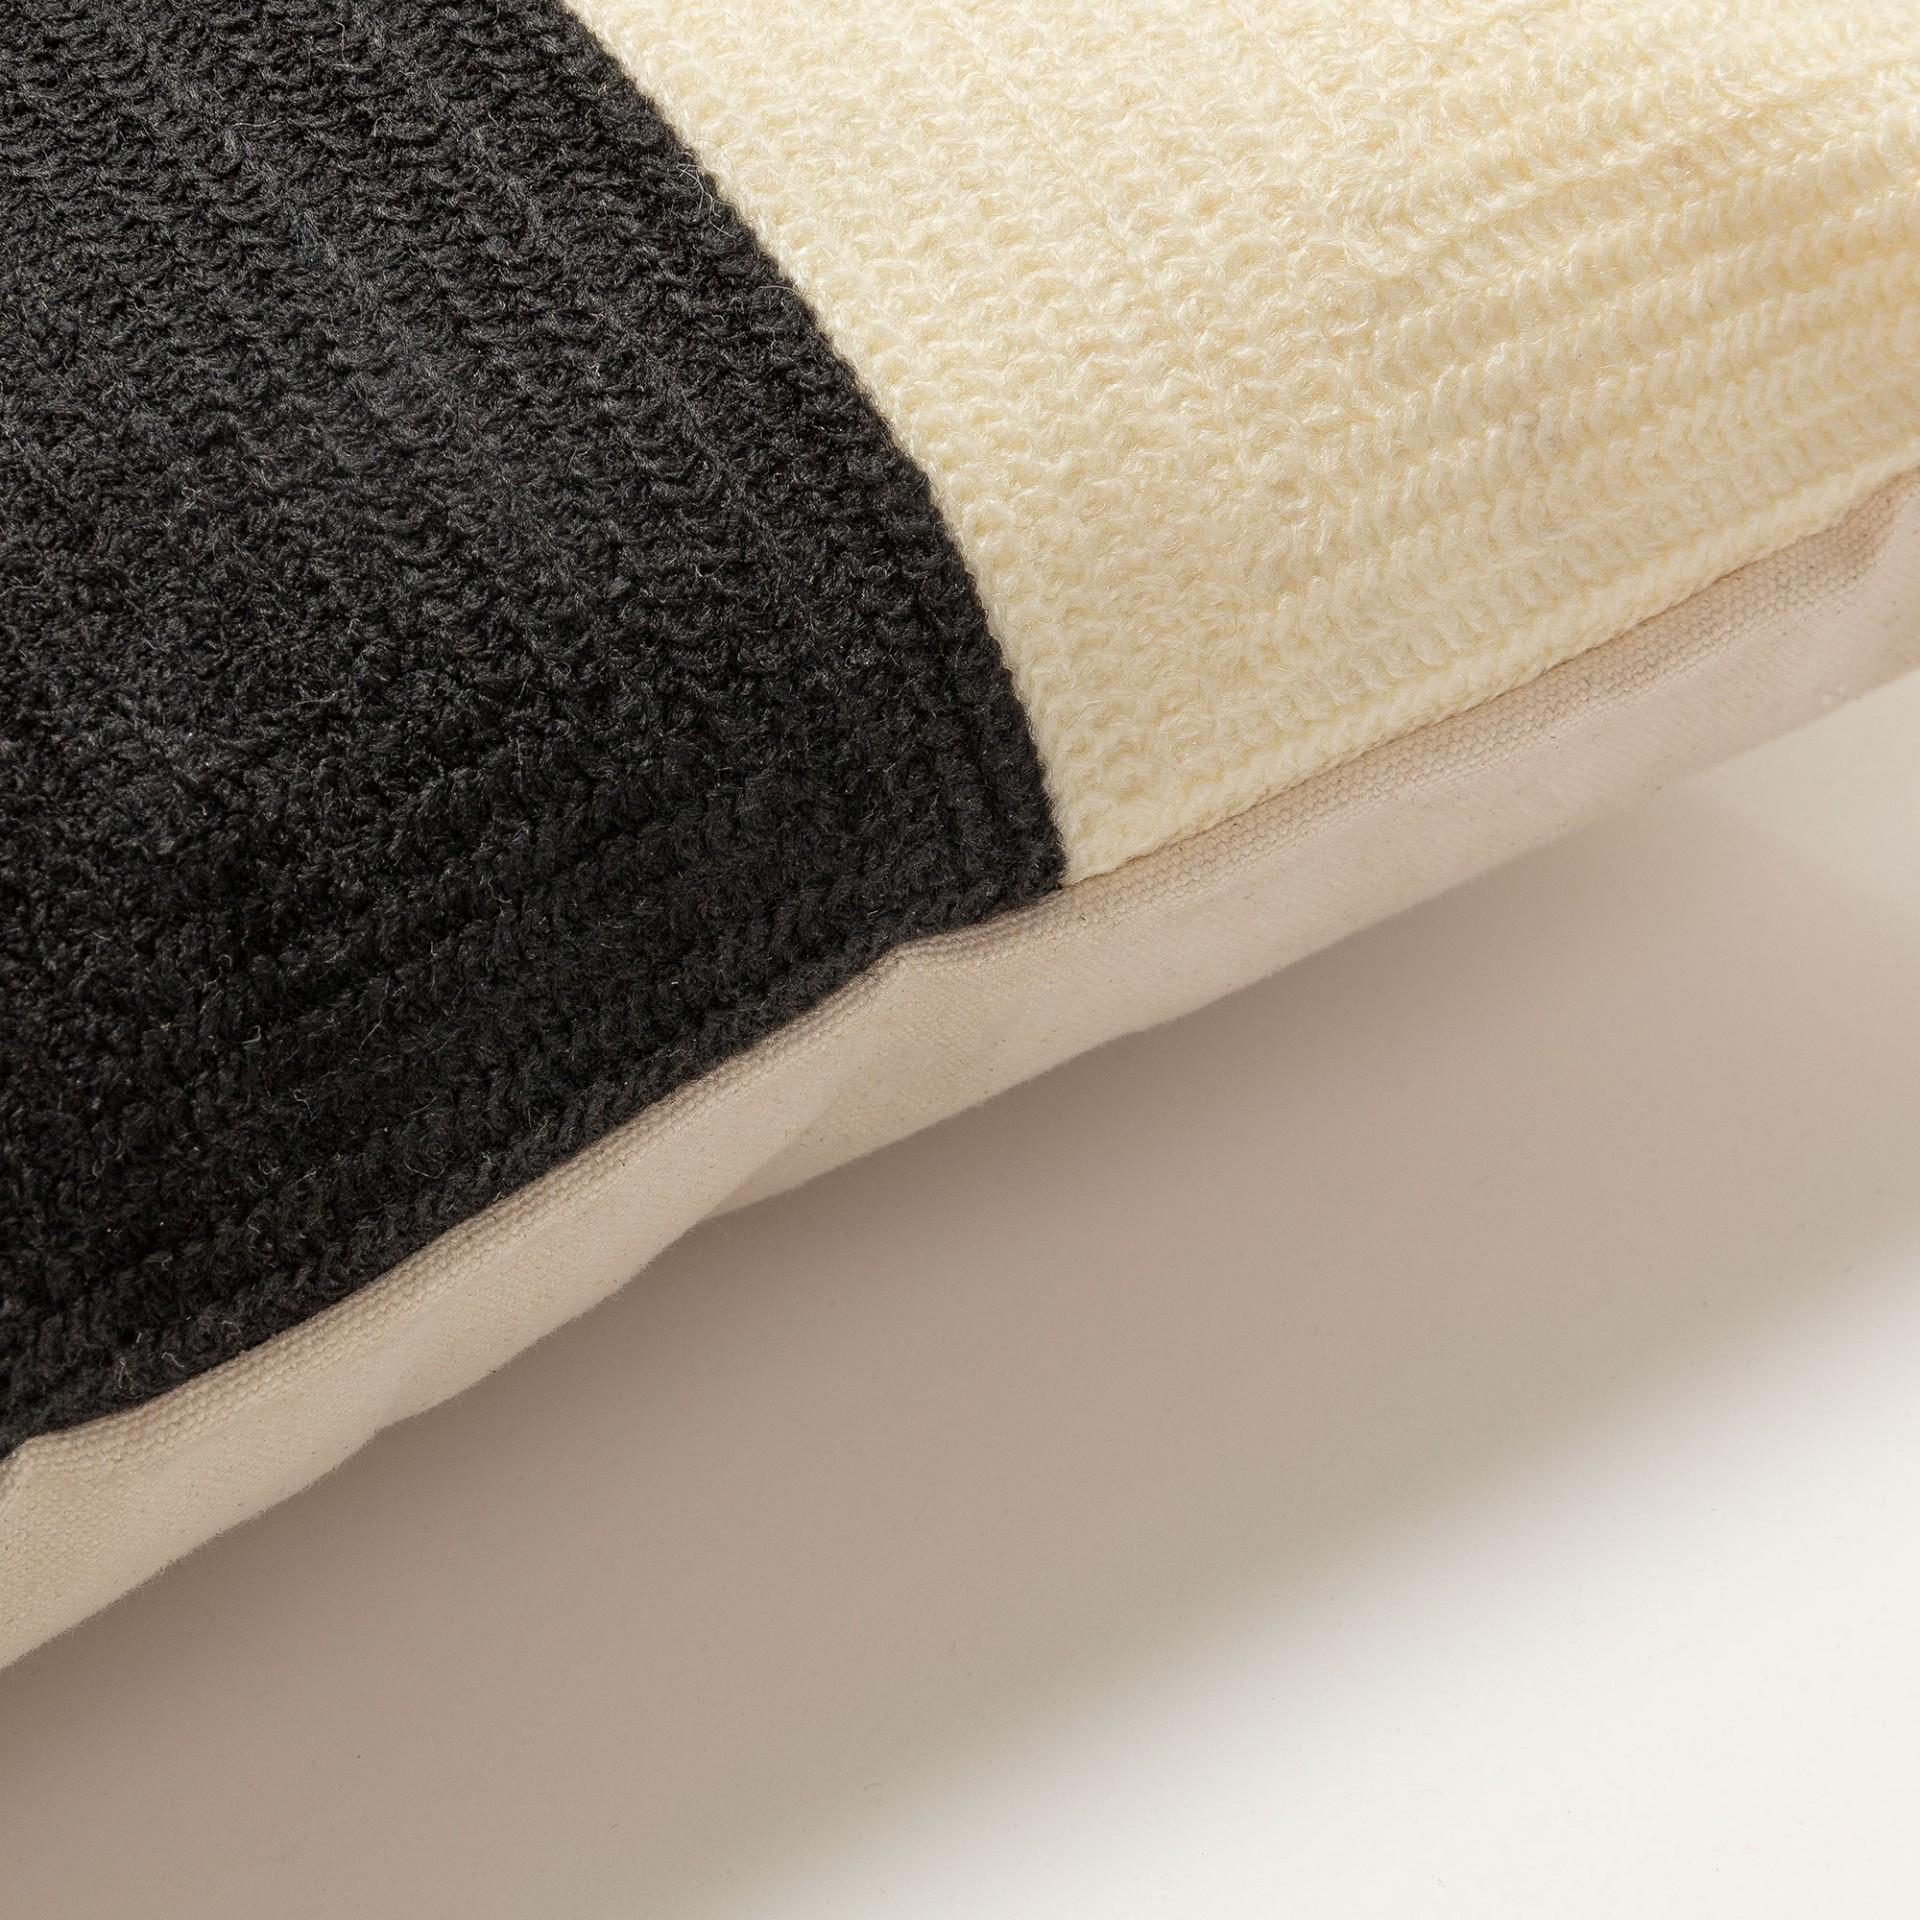 Capa de almofada Sinner, bordada, multicolor, 30x50 cm